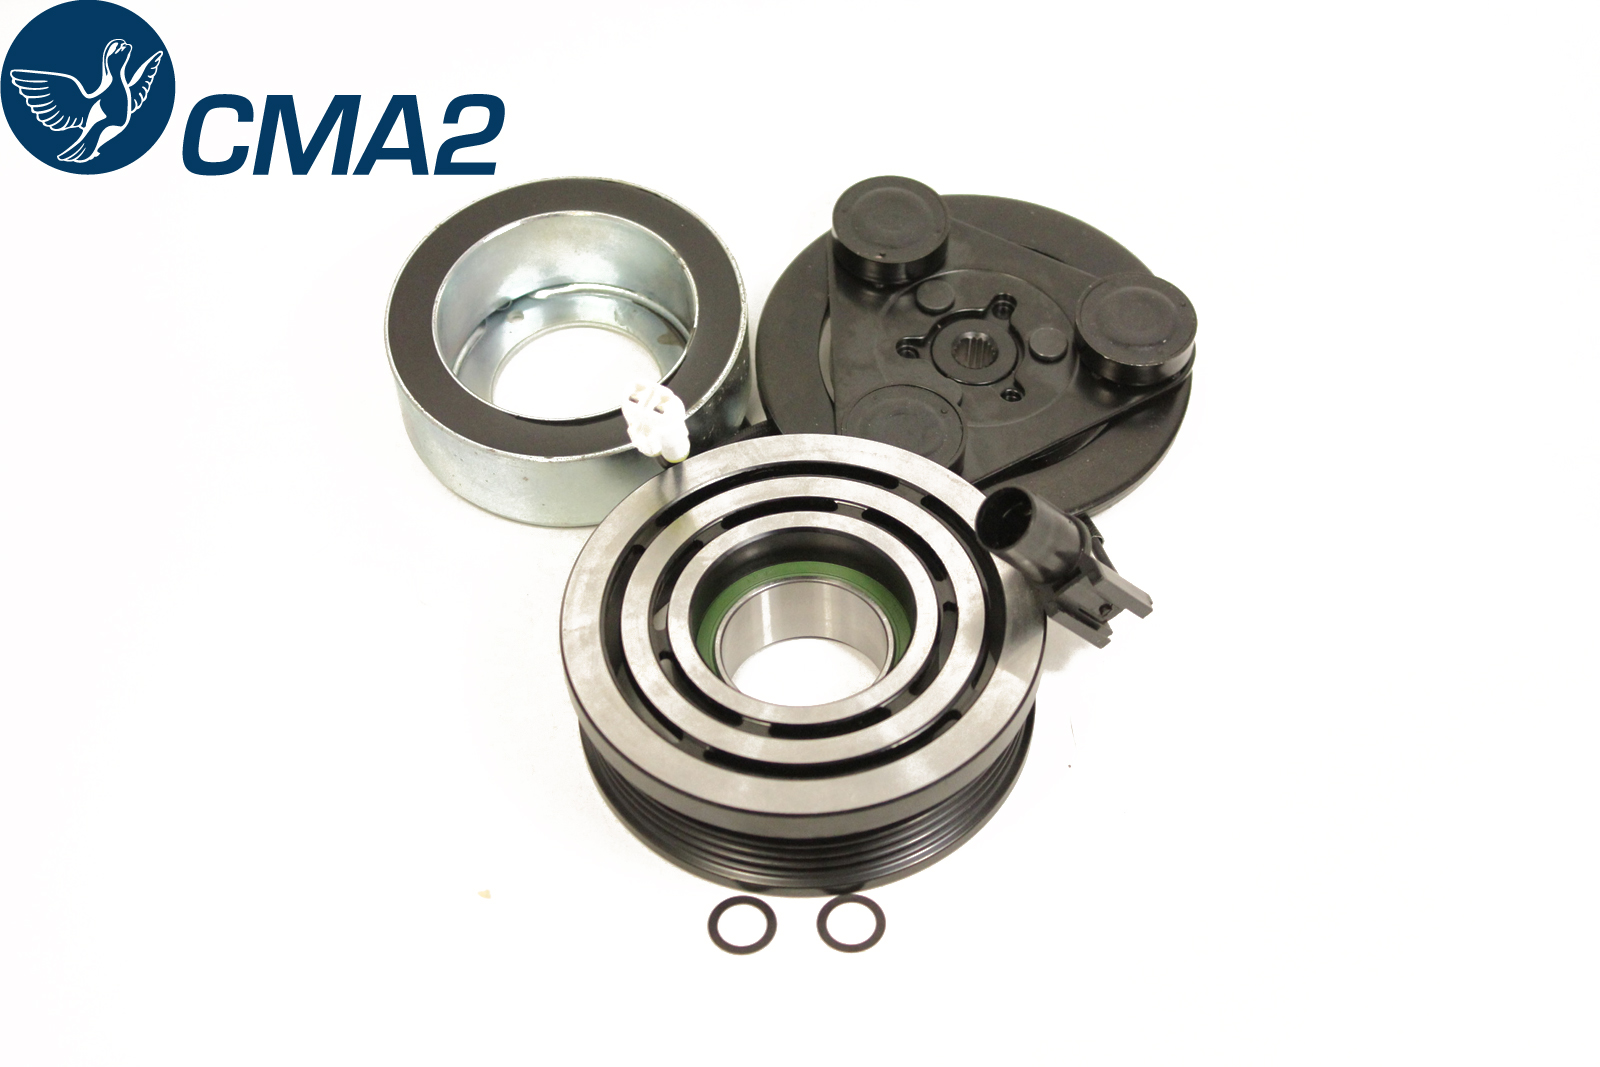 Муфта компрессора кондиционера Митсубиси Лансер 9 1.3, 1.6 AKC006A223, AKC006A224, MR315936, MR460108, MR460109.